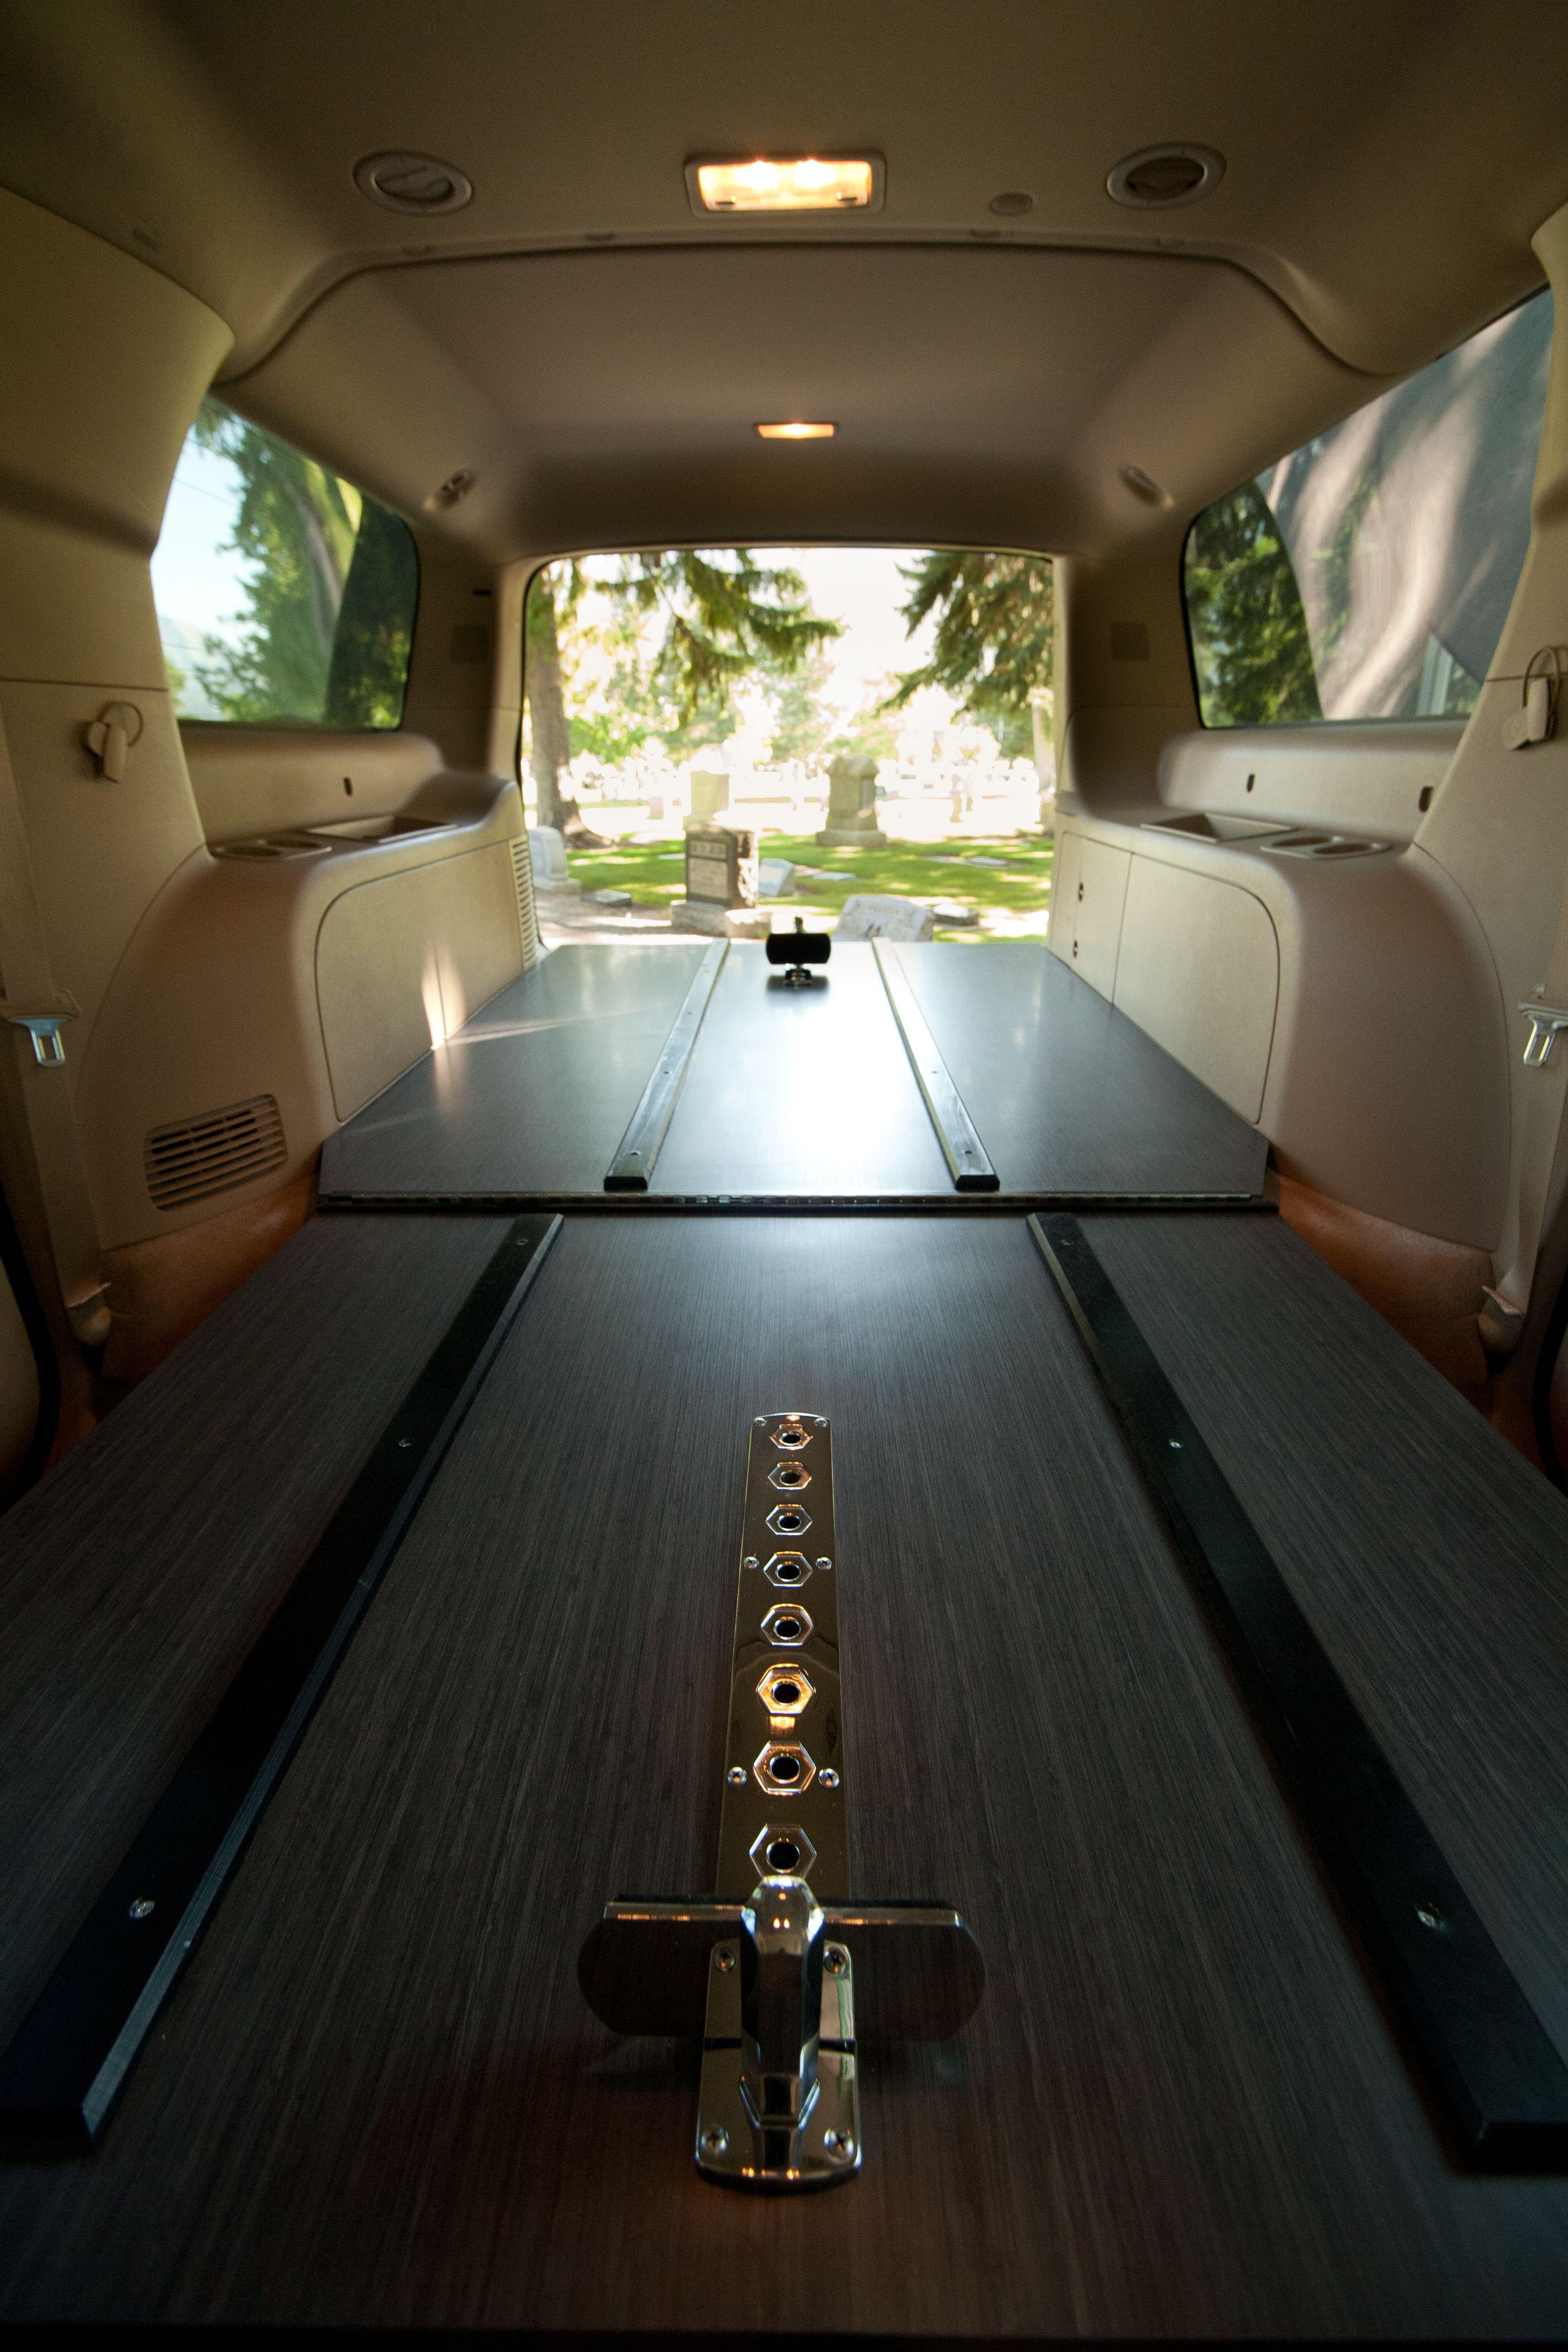 Spanish Fork Utah Casket Vehicle Cremation Services Funeral